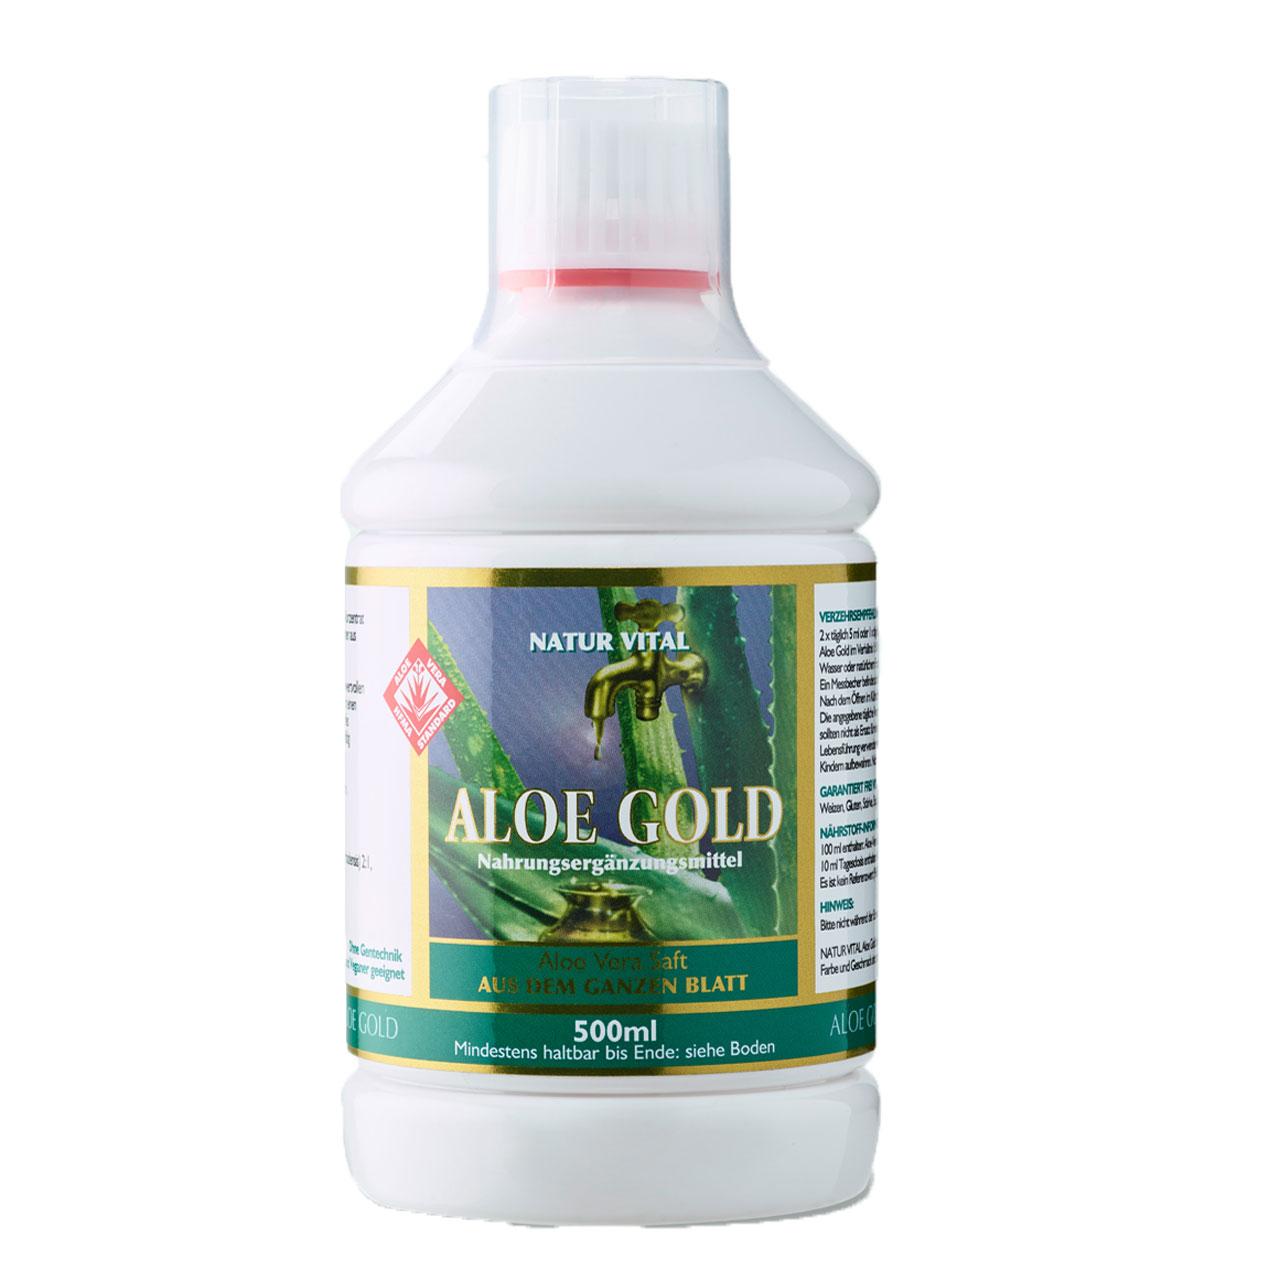 Aloe Gold (Saft), 500 ml